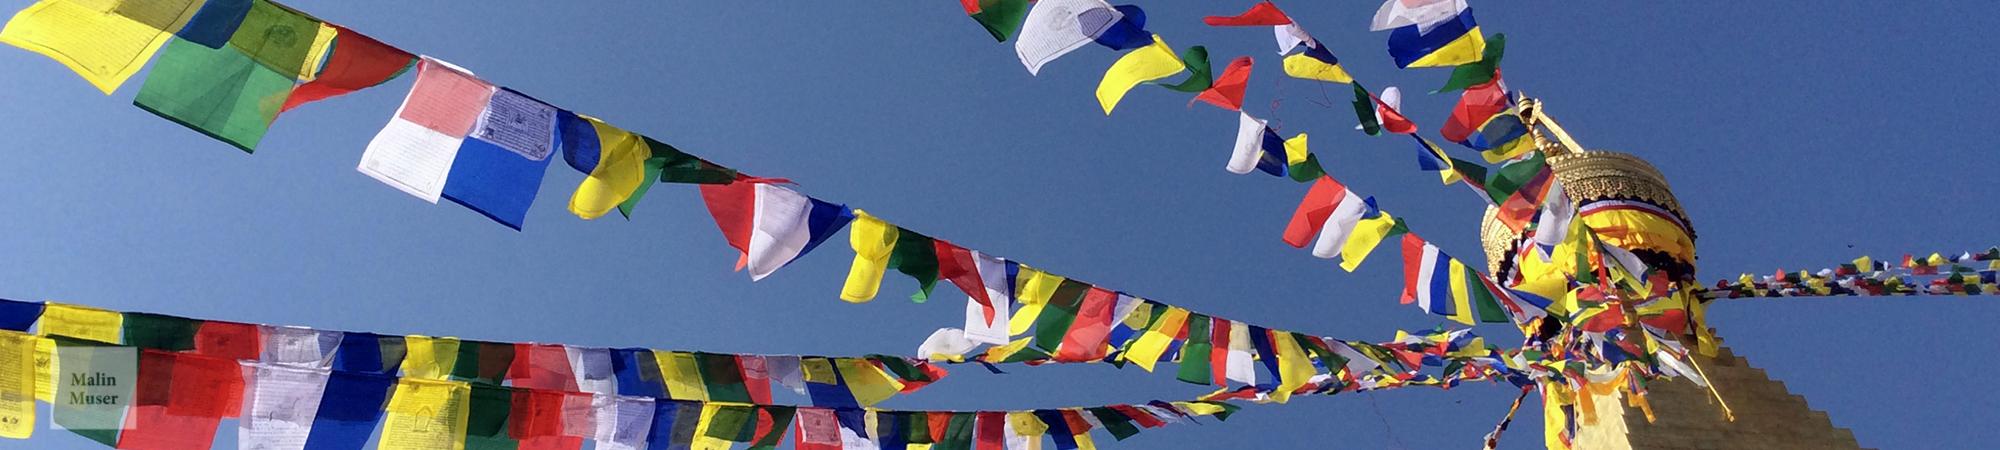 Gebetsfahnen im Buddhanath Tempel in Kathmandu (Nepal)